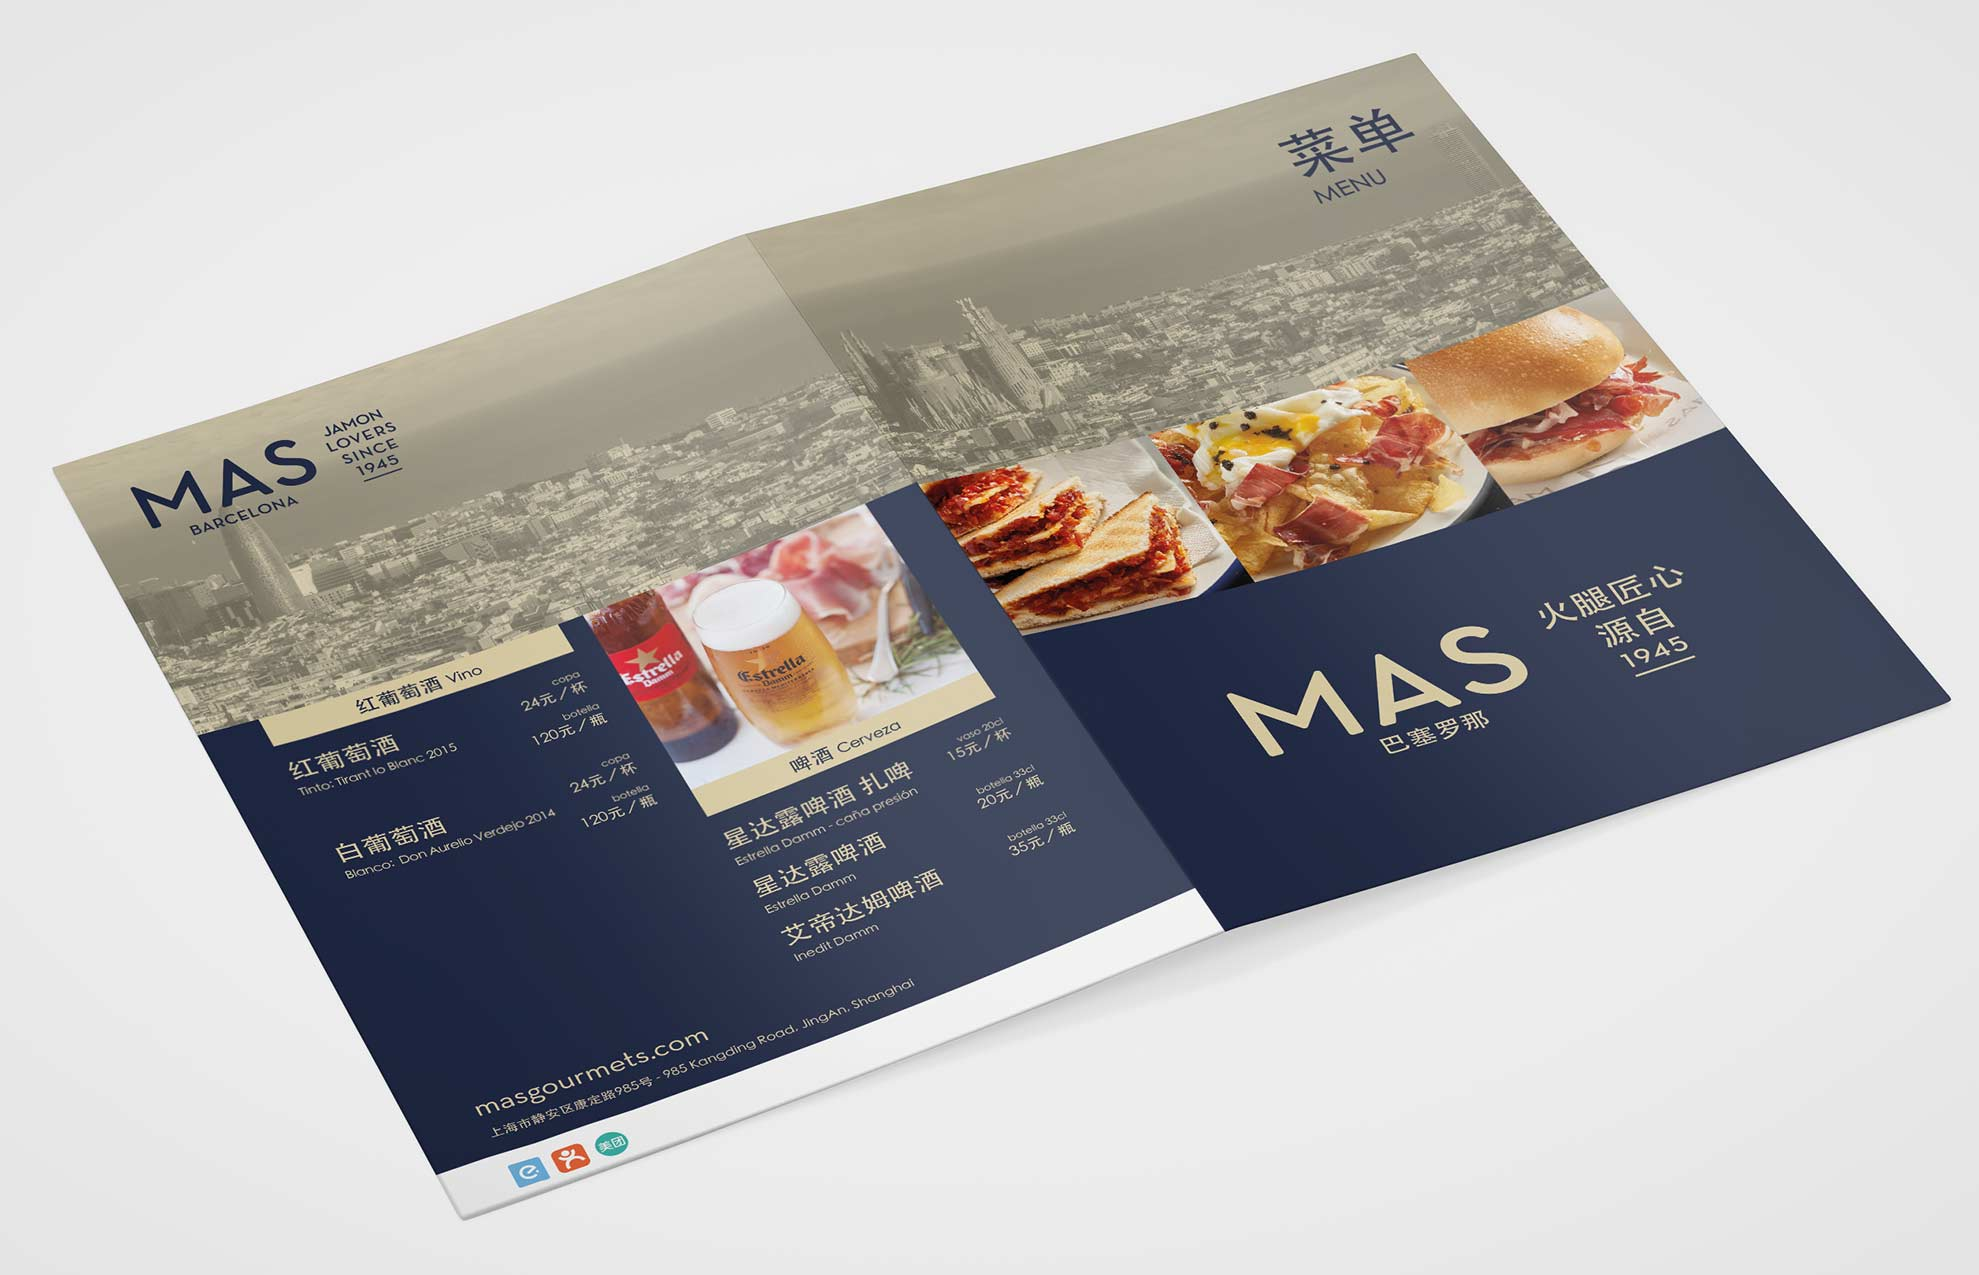 adaptacion diseno grafico shangai - Estrategia en branding y comunicación comercial para exportar a China